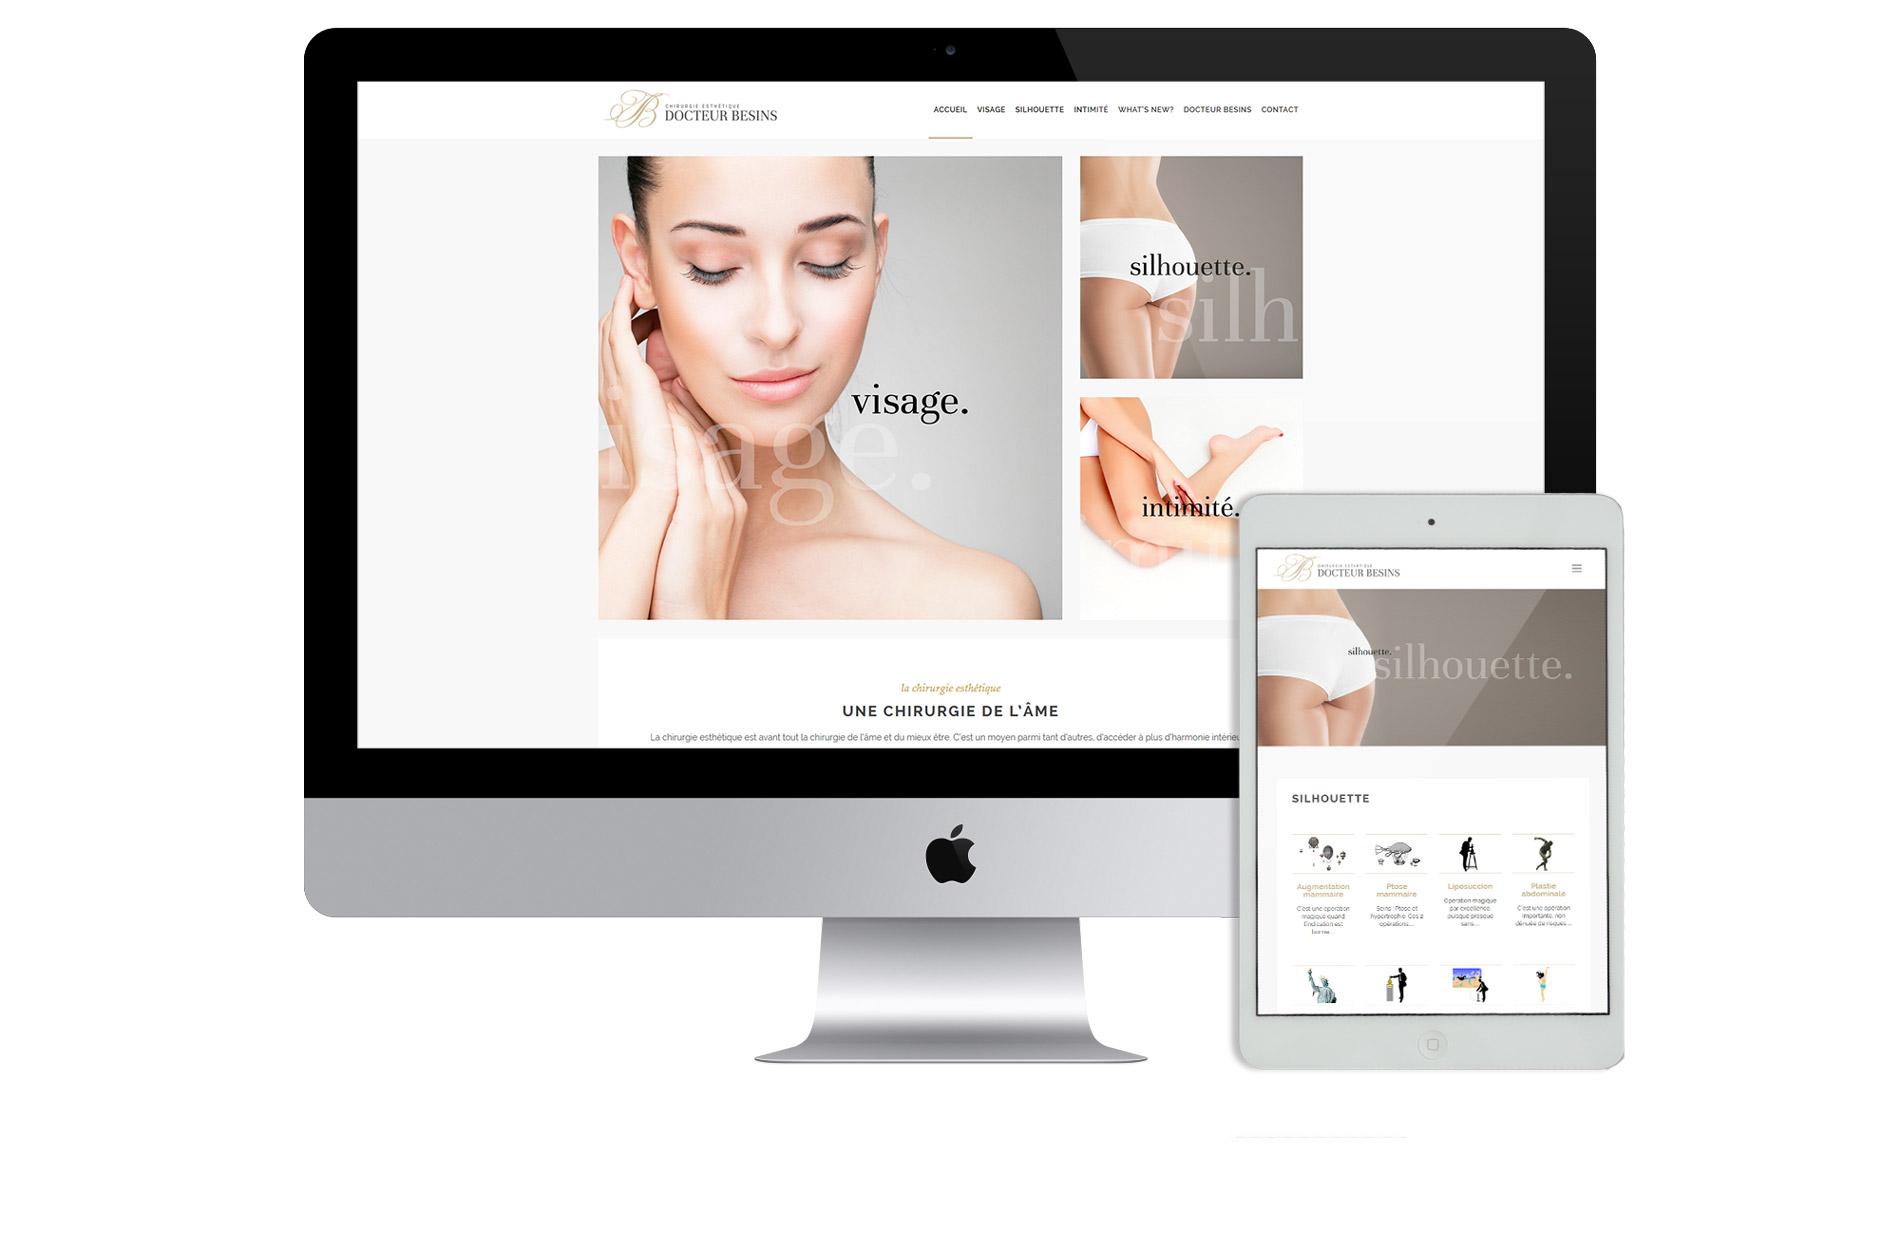 Création site web Dr Besins nice